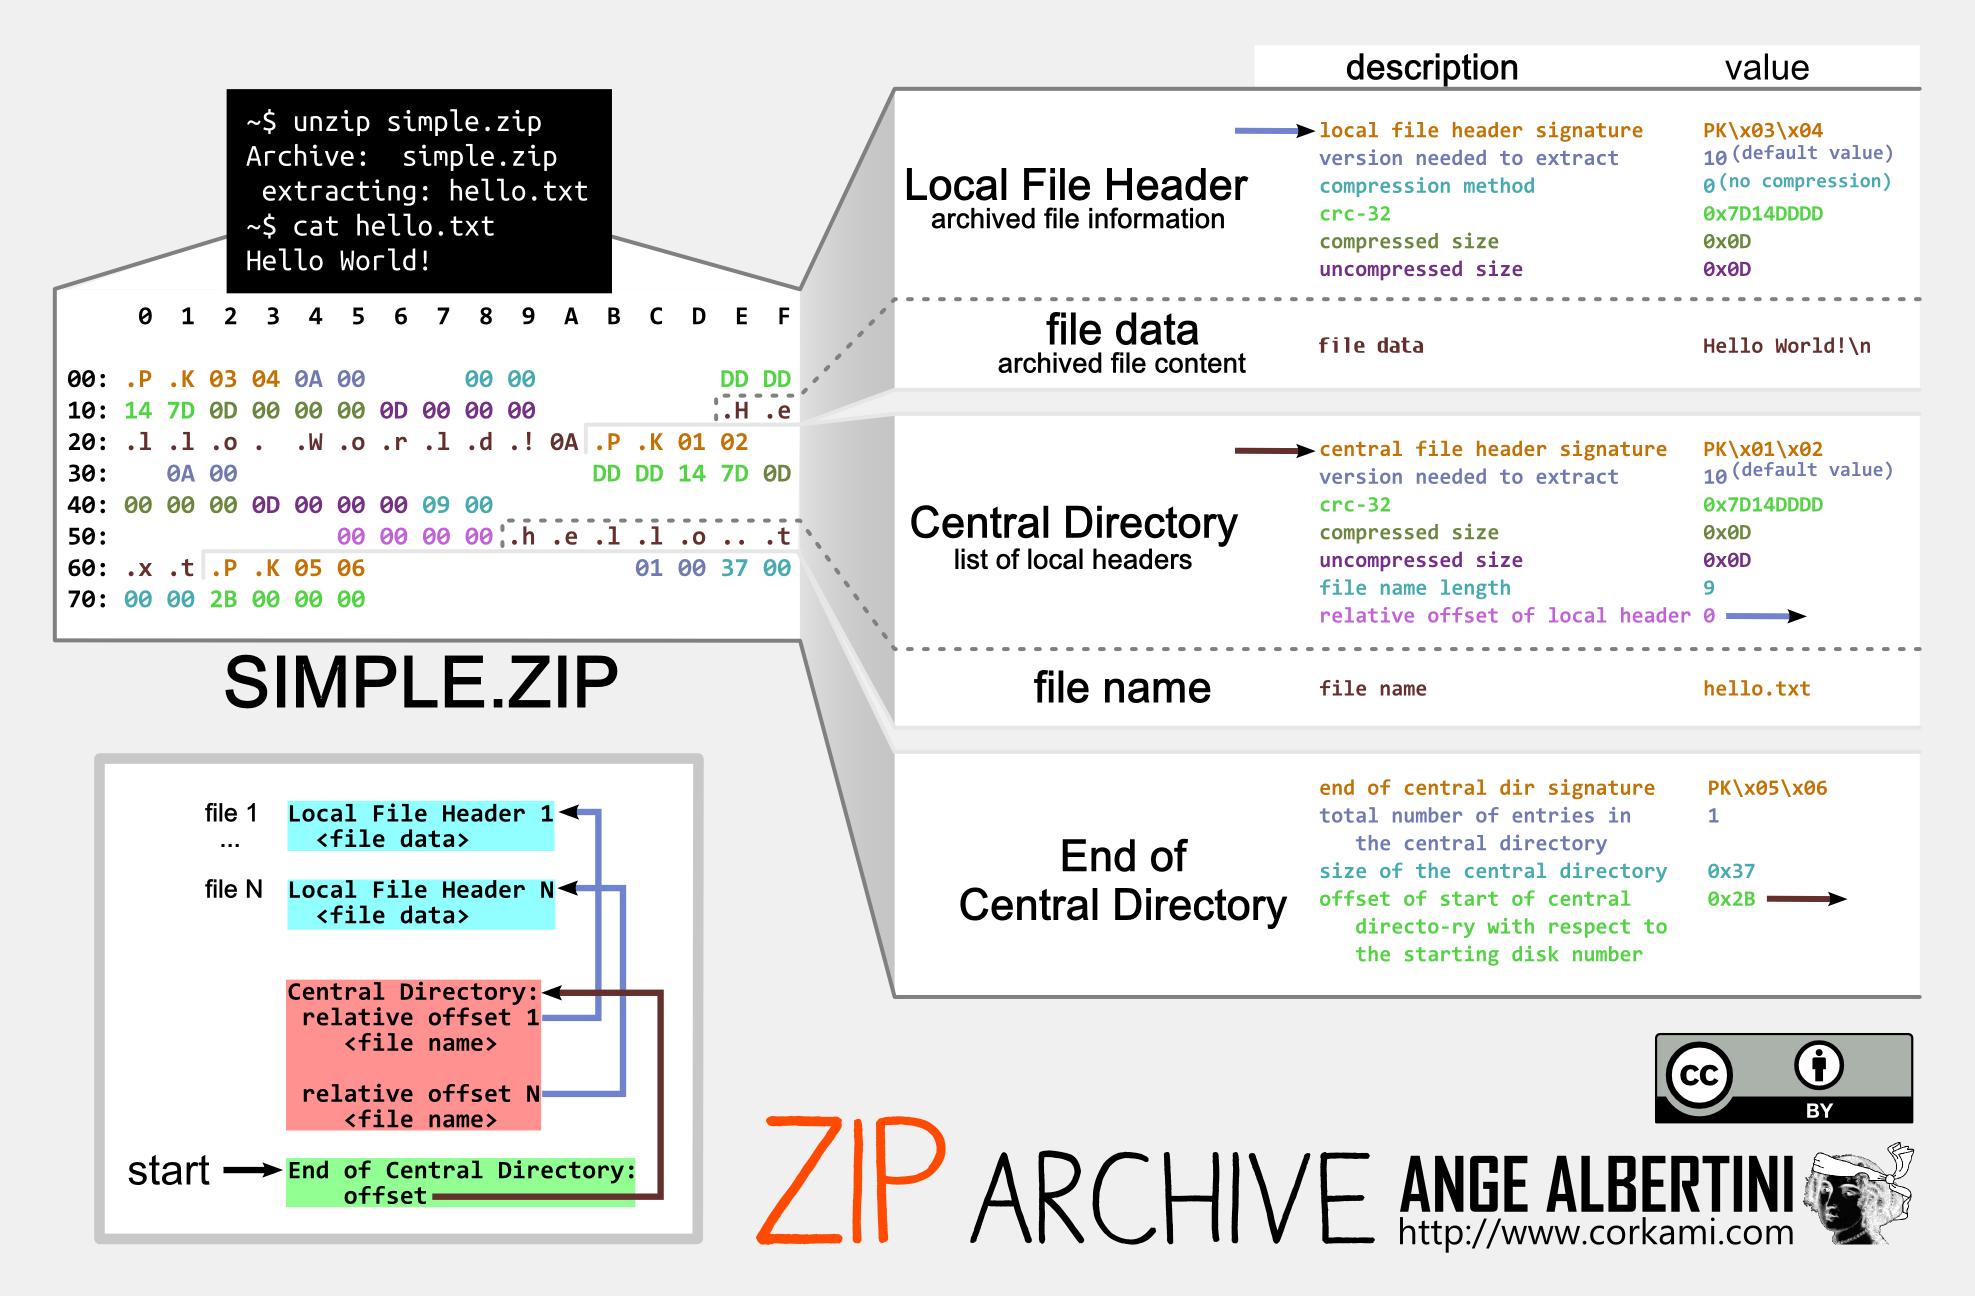 a ZIP file